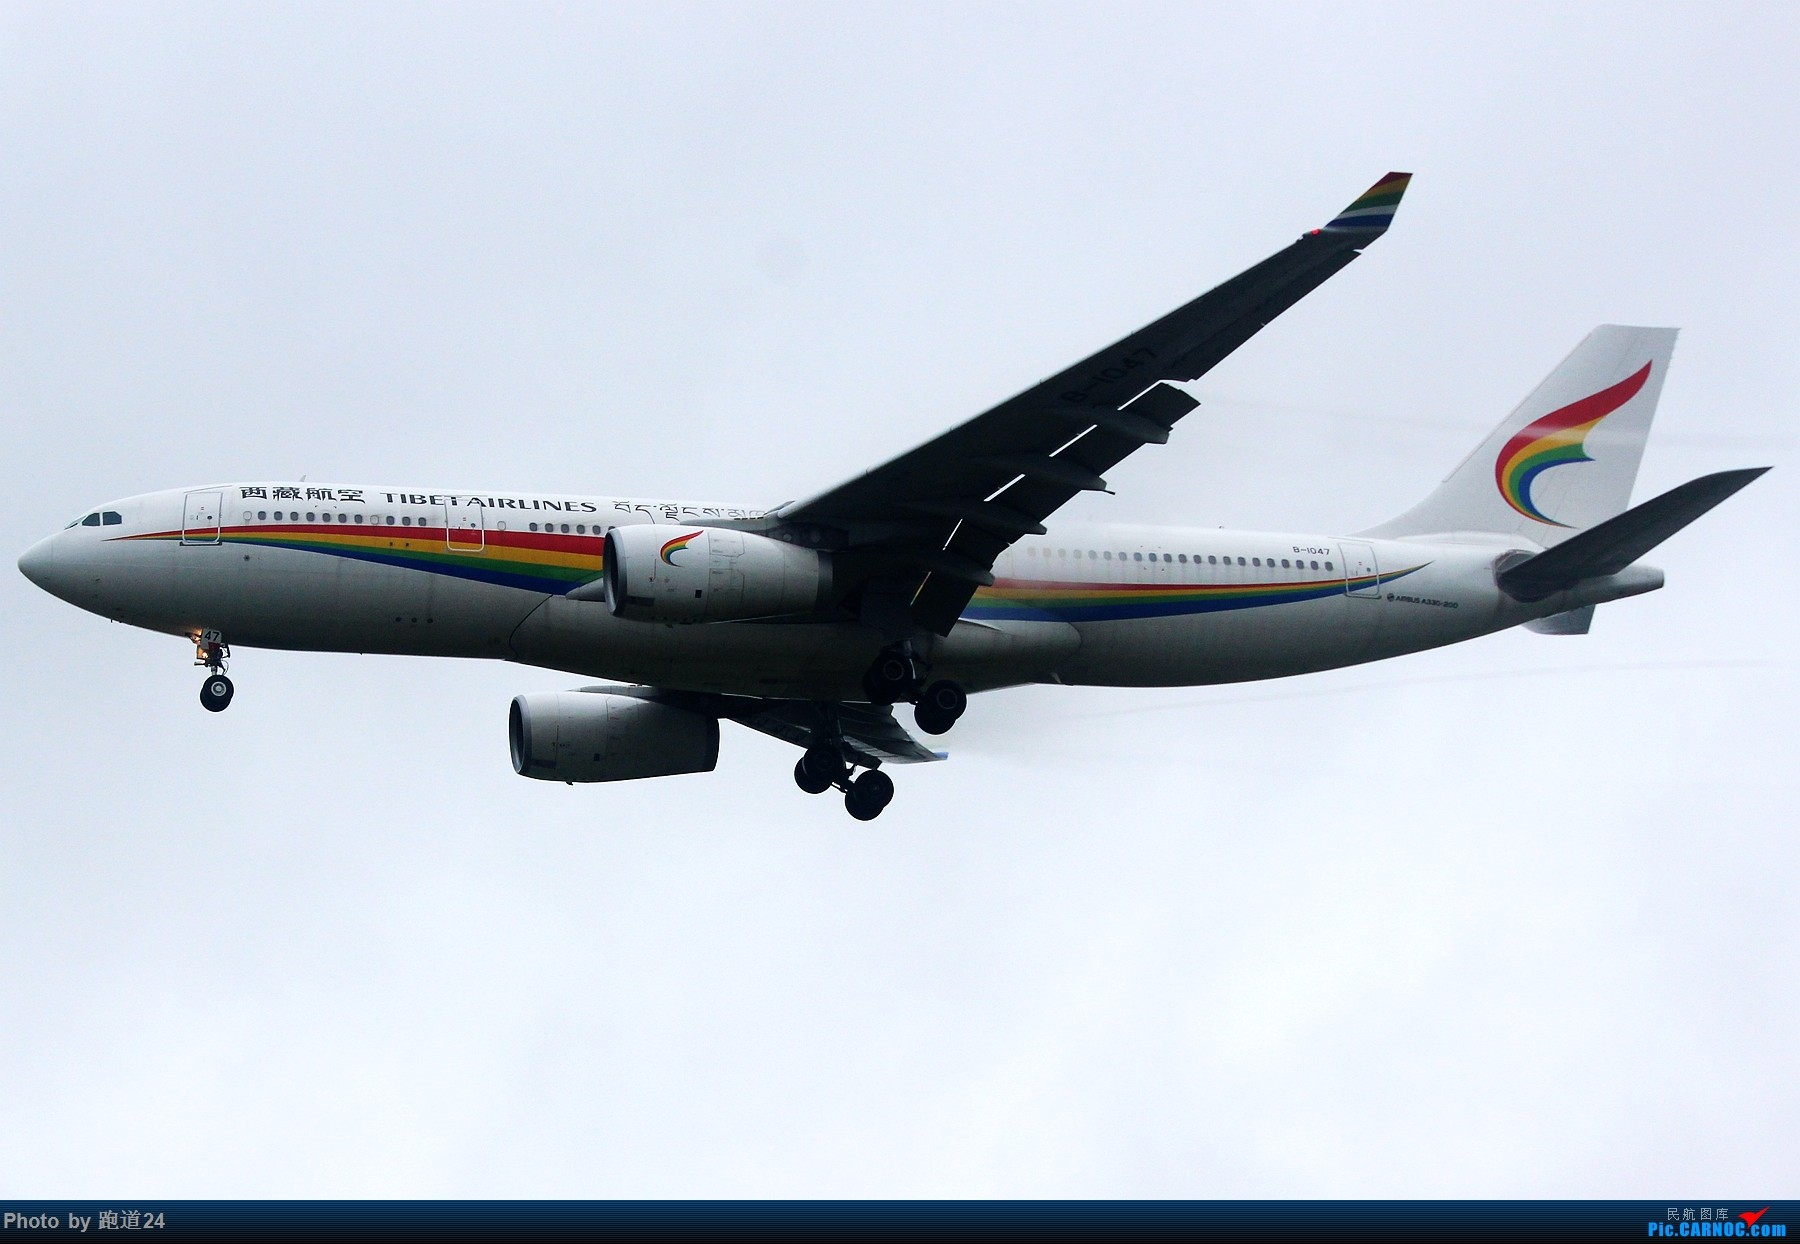 Re:[多图党]雨天CTU拍机 1800*1200 AIRBUS A330-200 B-1047 中国成都双流国际机场